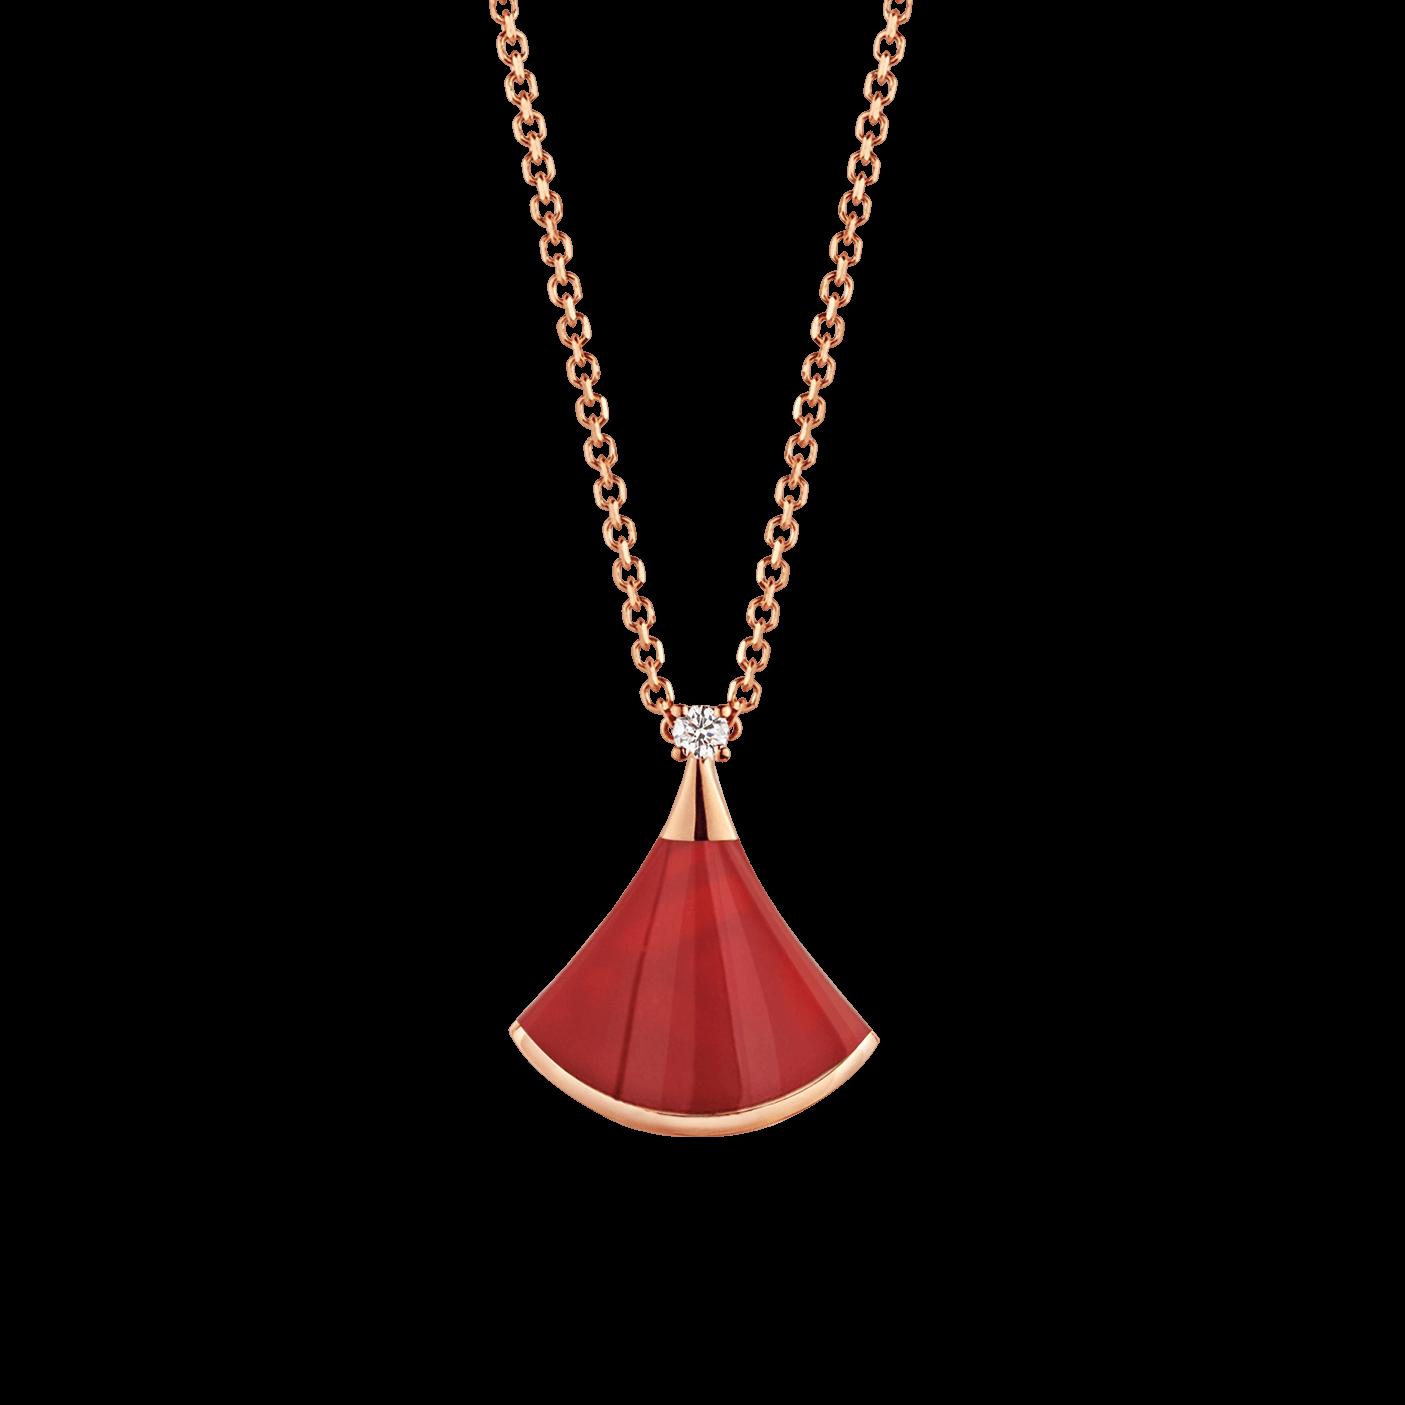 imitation bulgari necklace gold